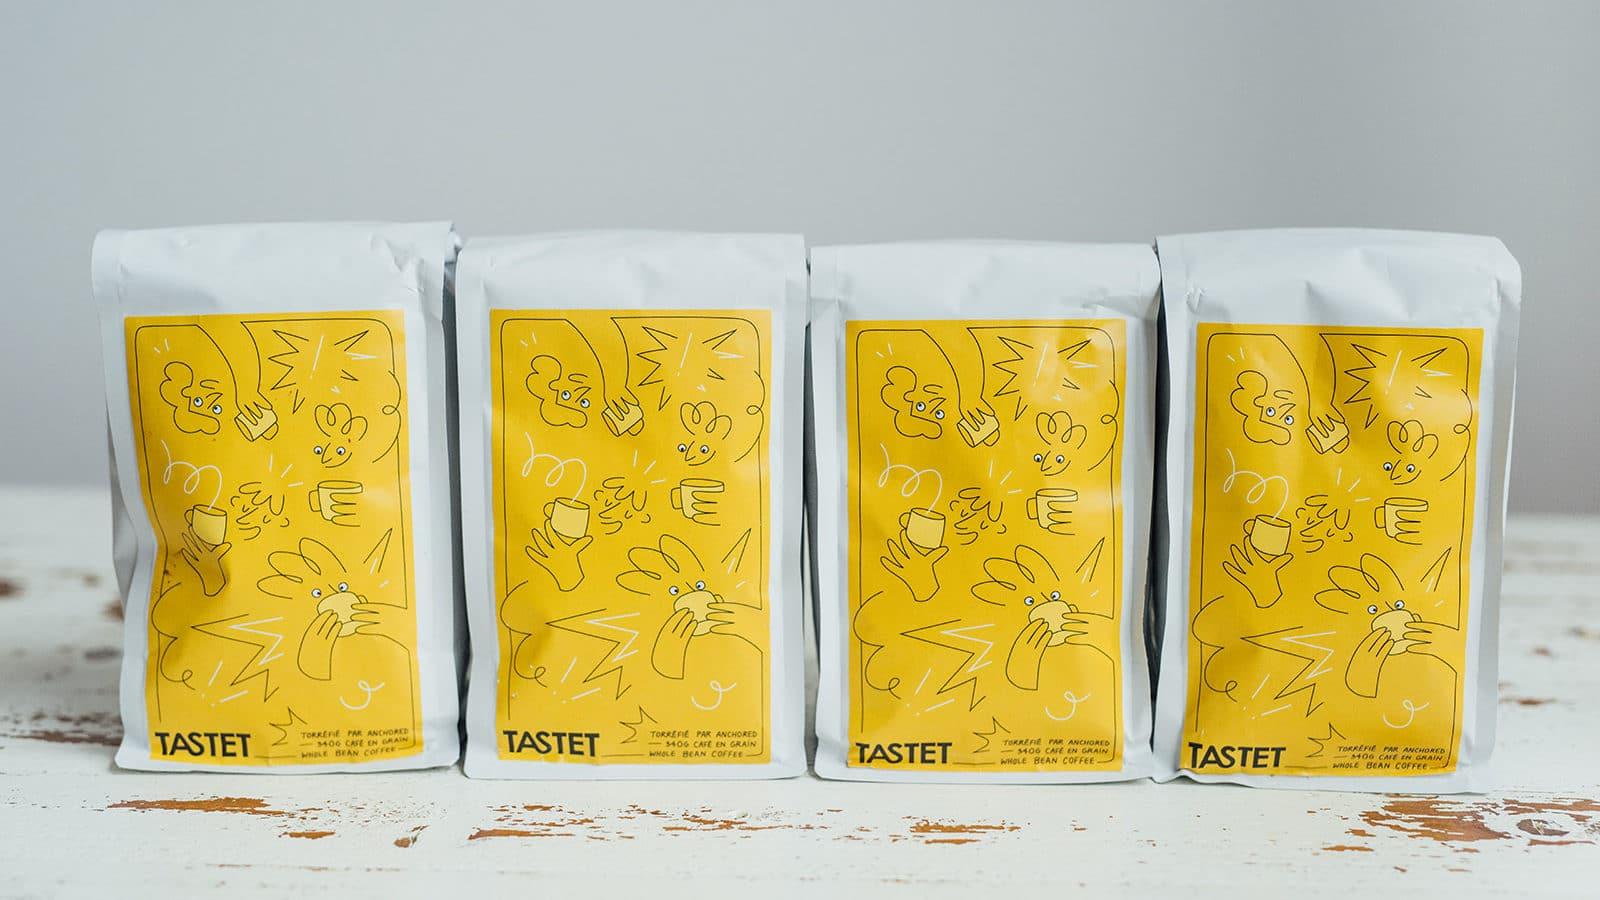 Café tastet anchored coffee